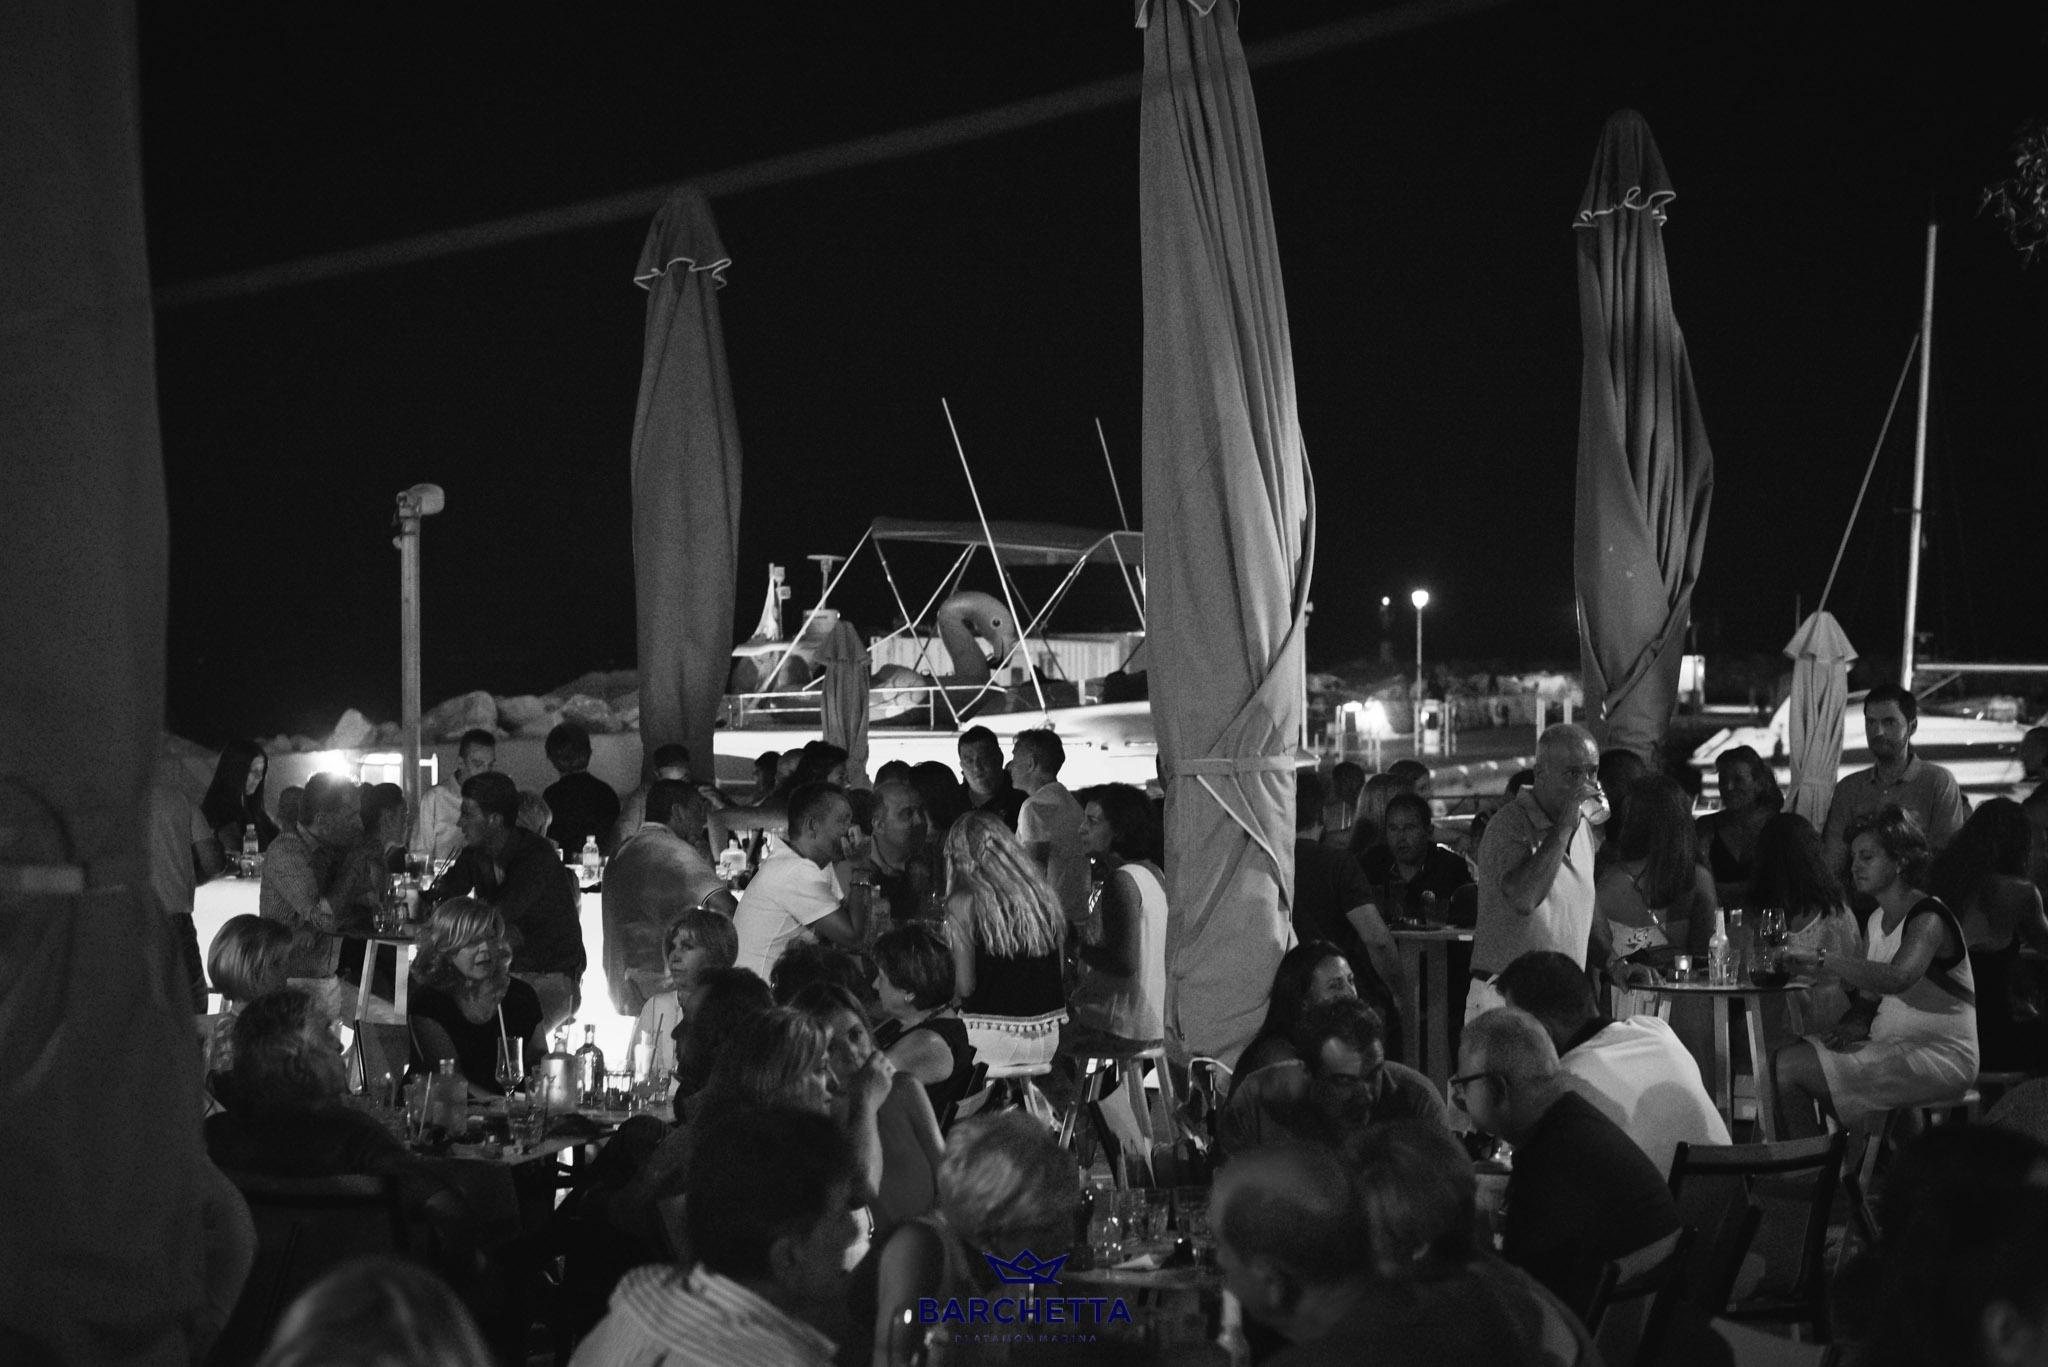 DSC 7257 - Barchetta | Σάββατο 5.8.2017